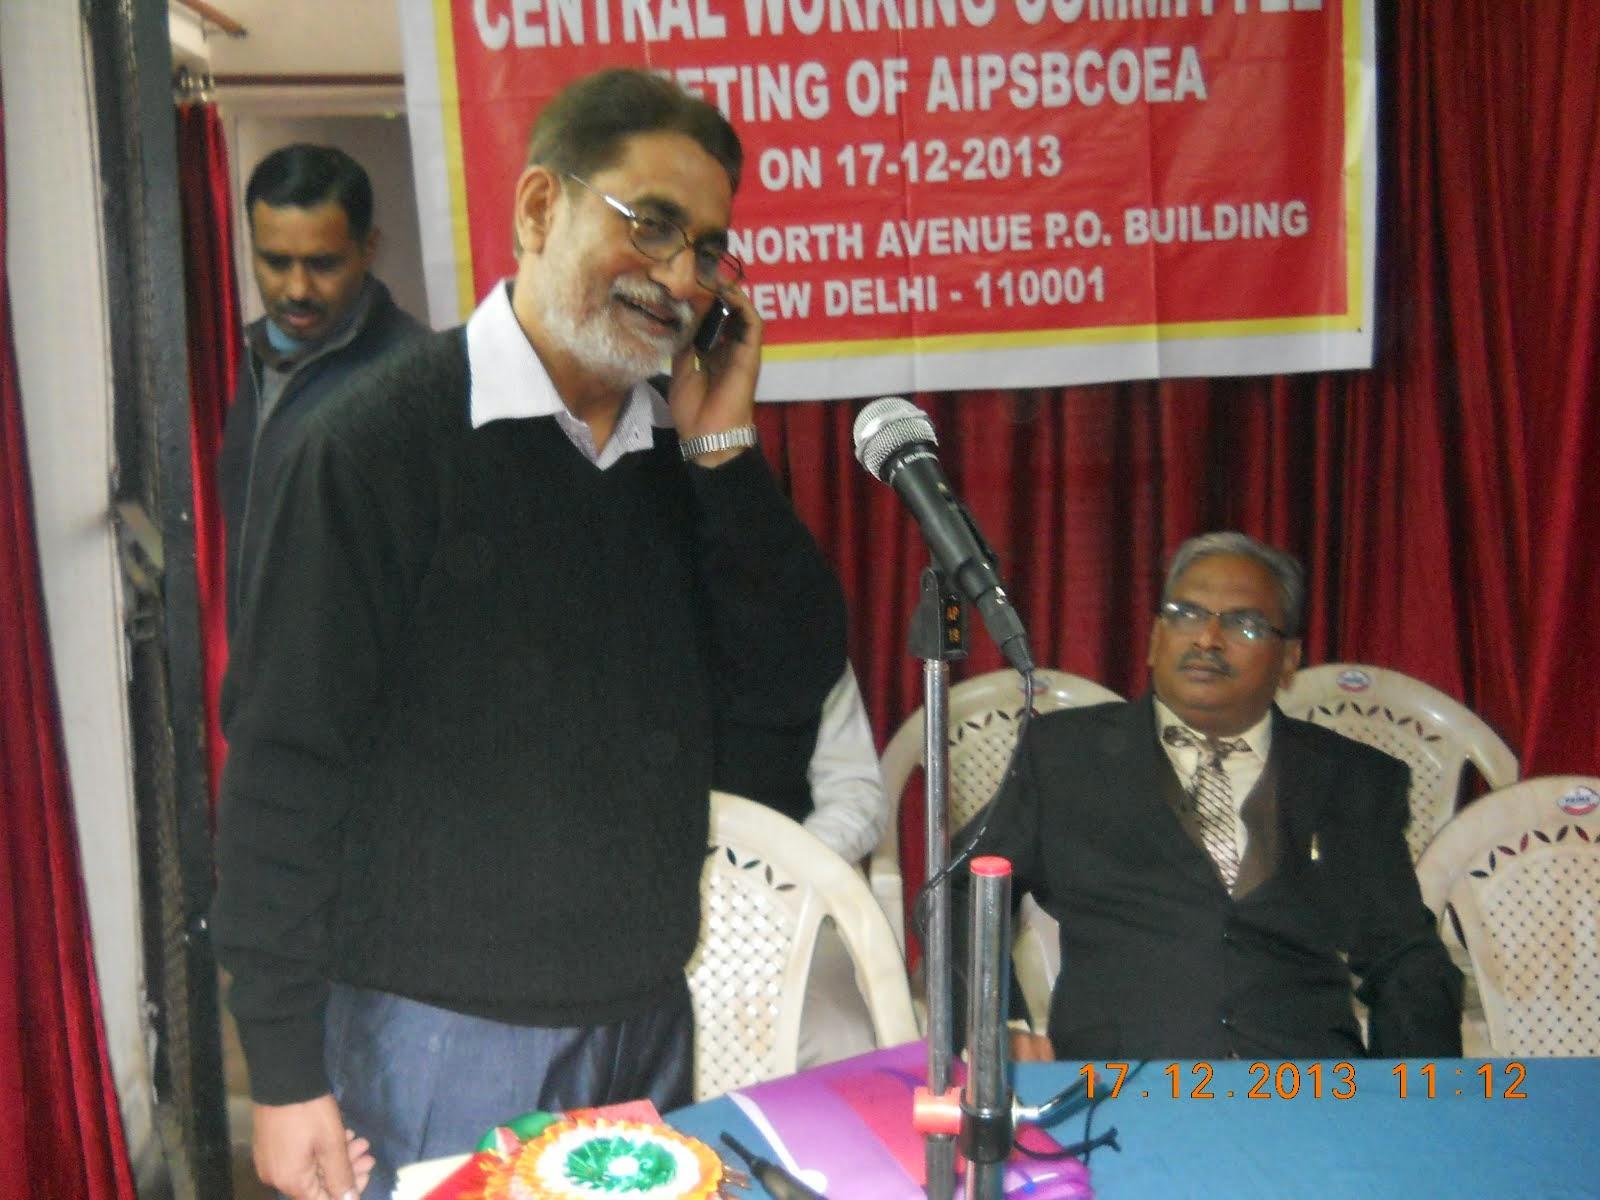 COM. Virendra Tiwari,General Secretary